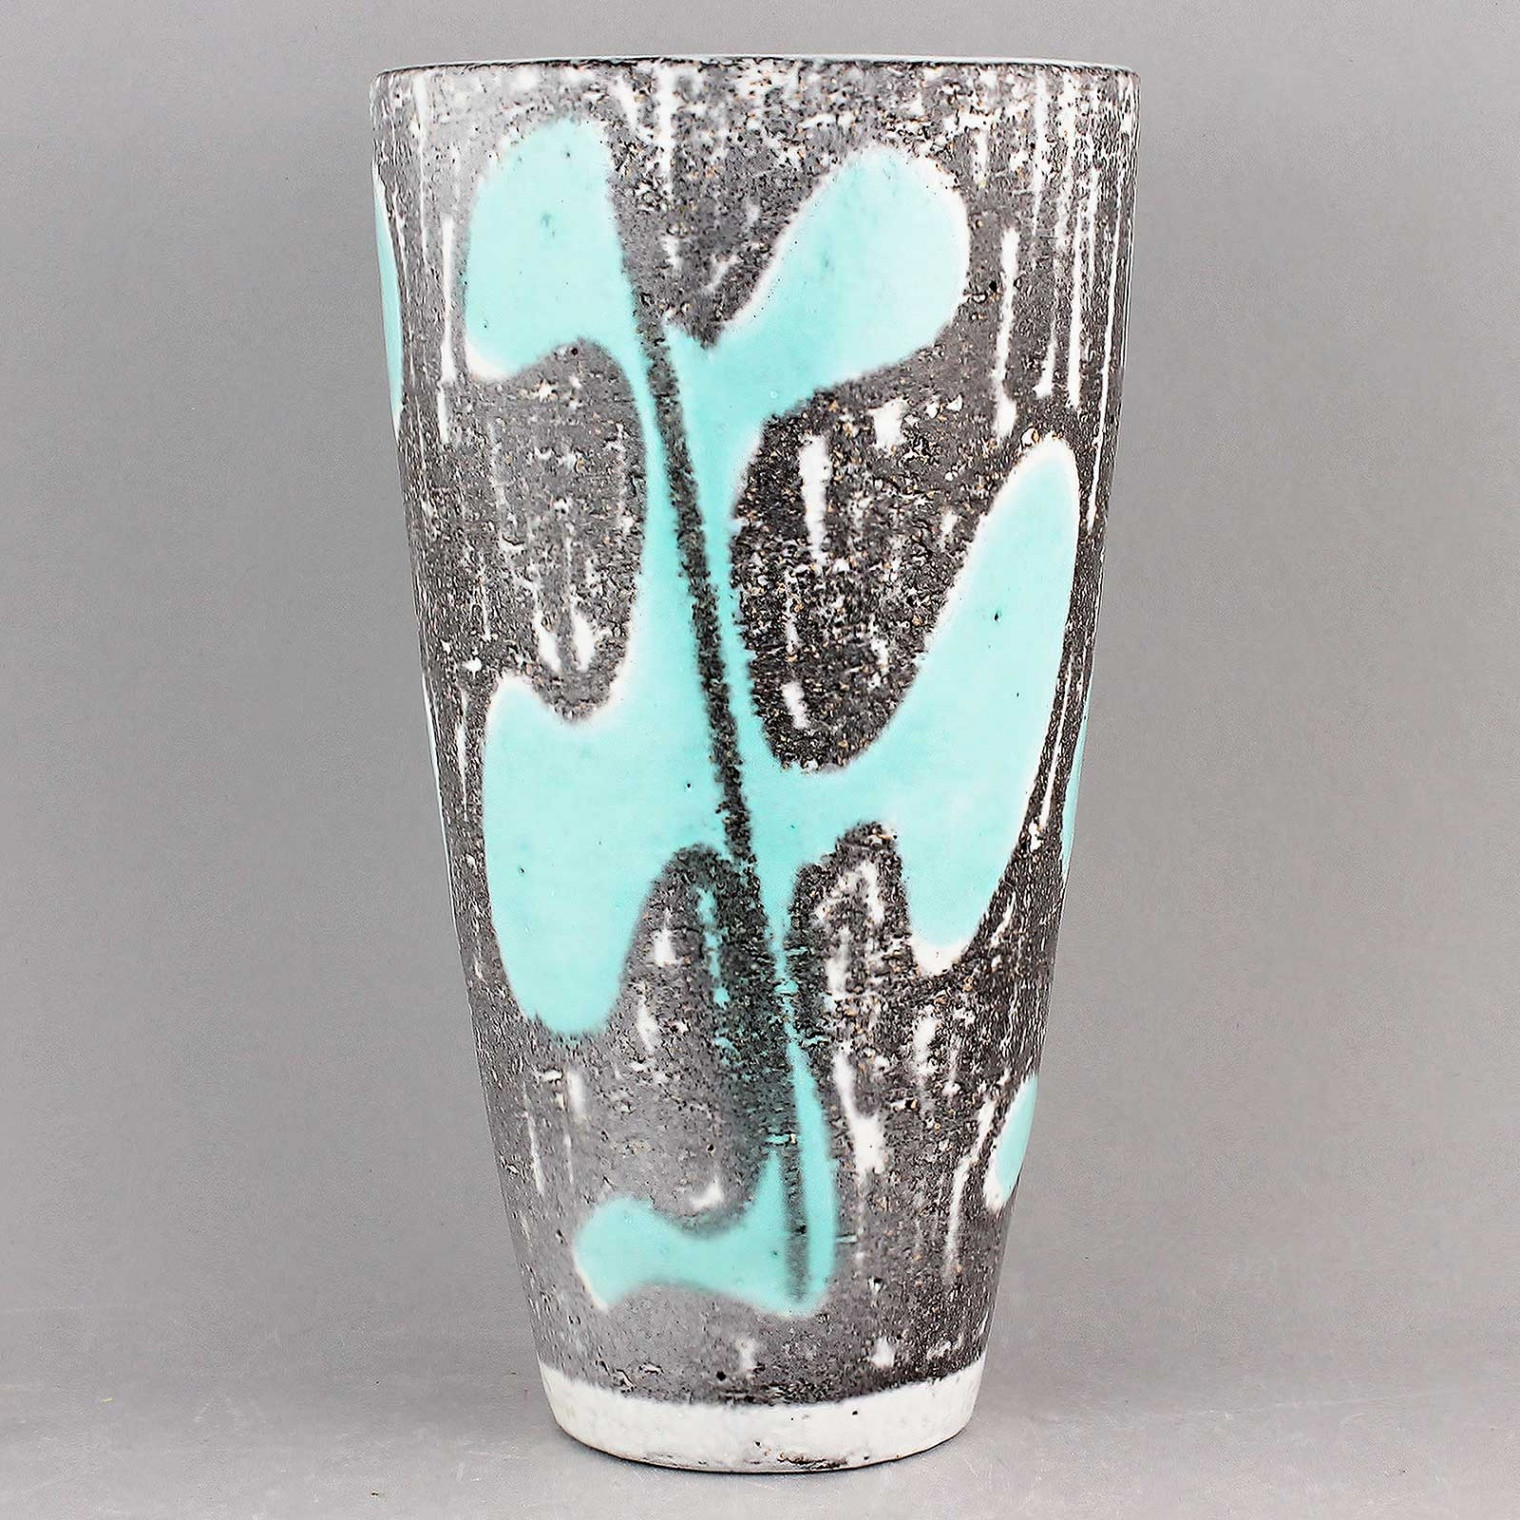 cheap turquoise vases of mari simmulson tahiti 1952 striking turquoise vase mother sweden throughout mari simmulson tahiti 1952 striking turquoise vase mother sweden objet deco turquoise